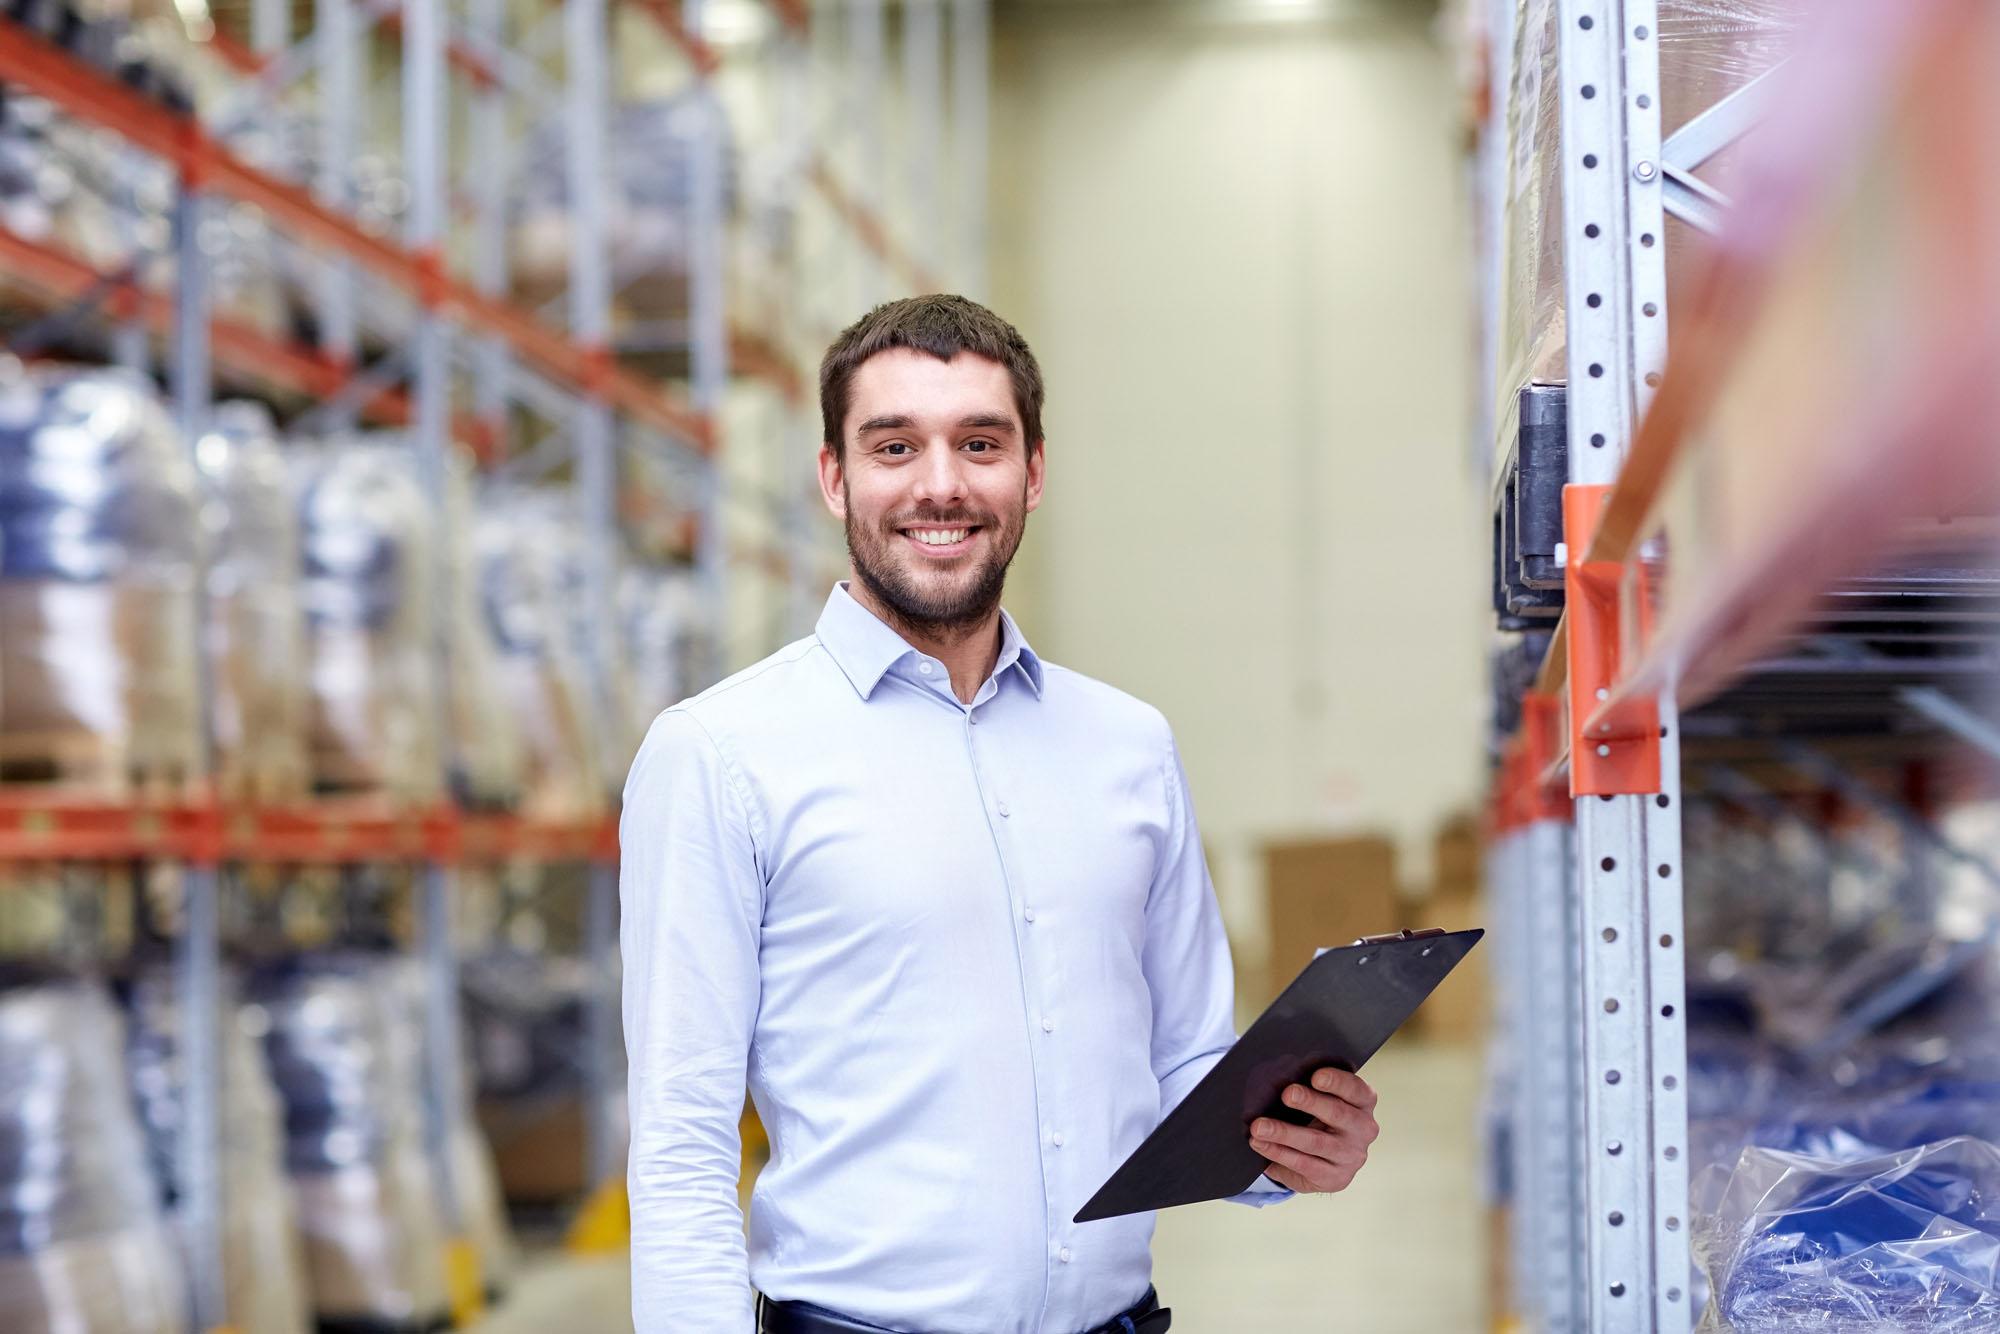 super health center services fulfillment warehousing consolidation customer service